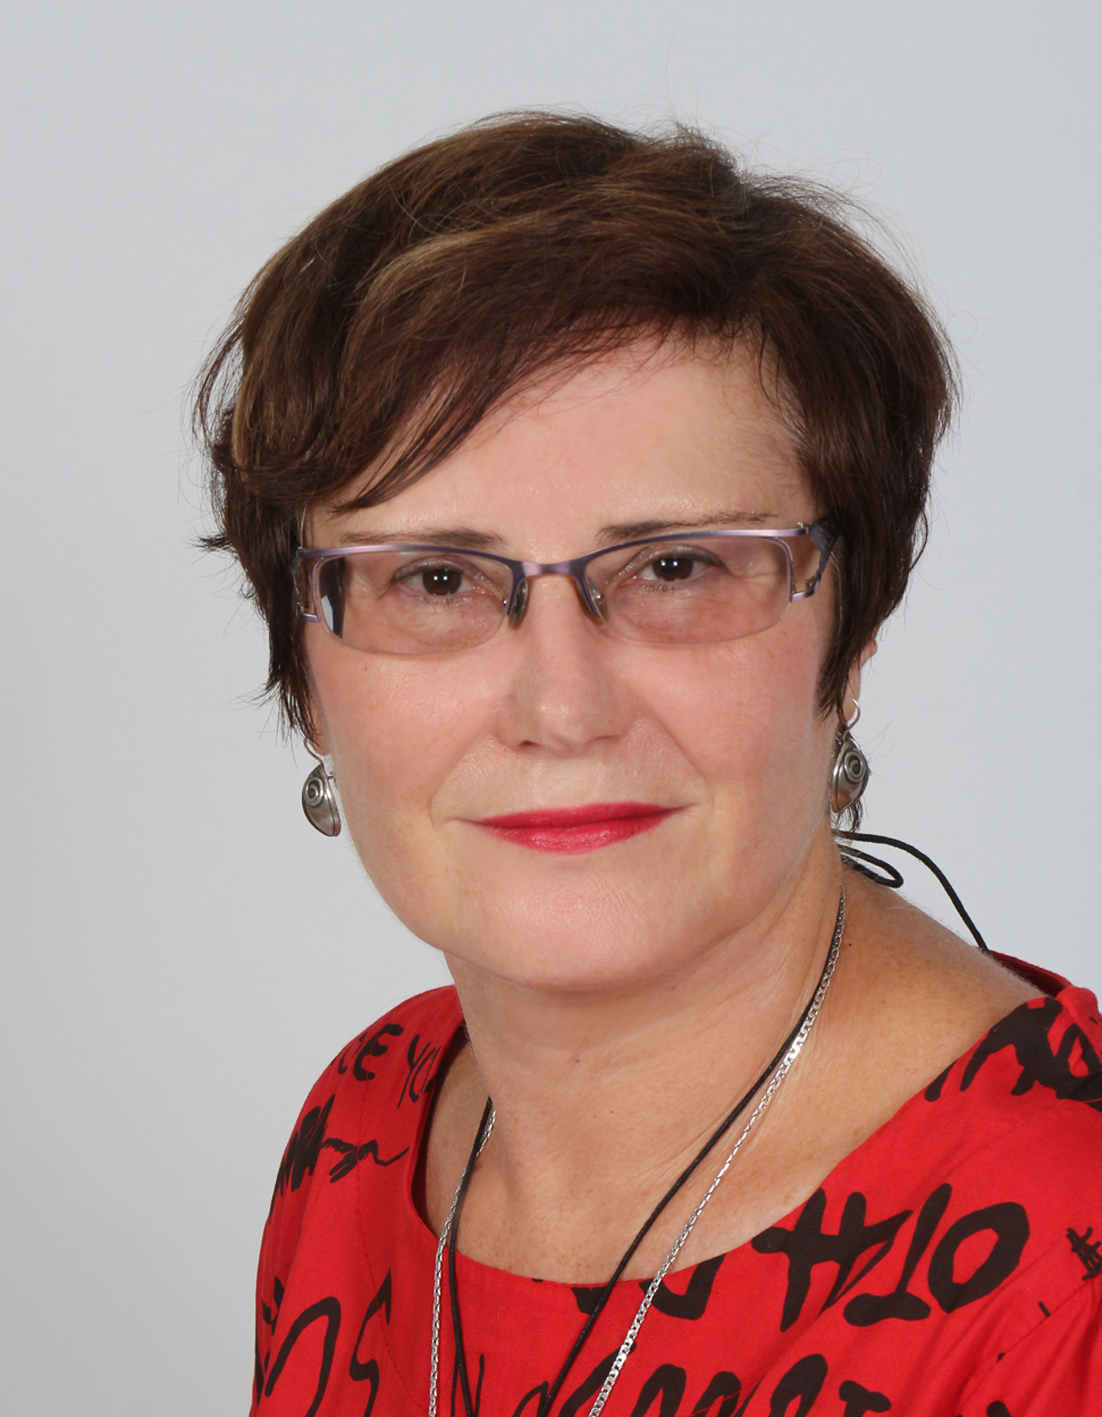 Галинка Чавдарова